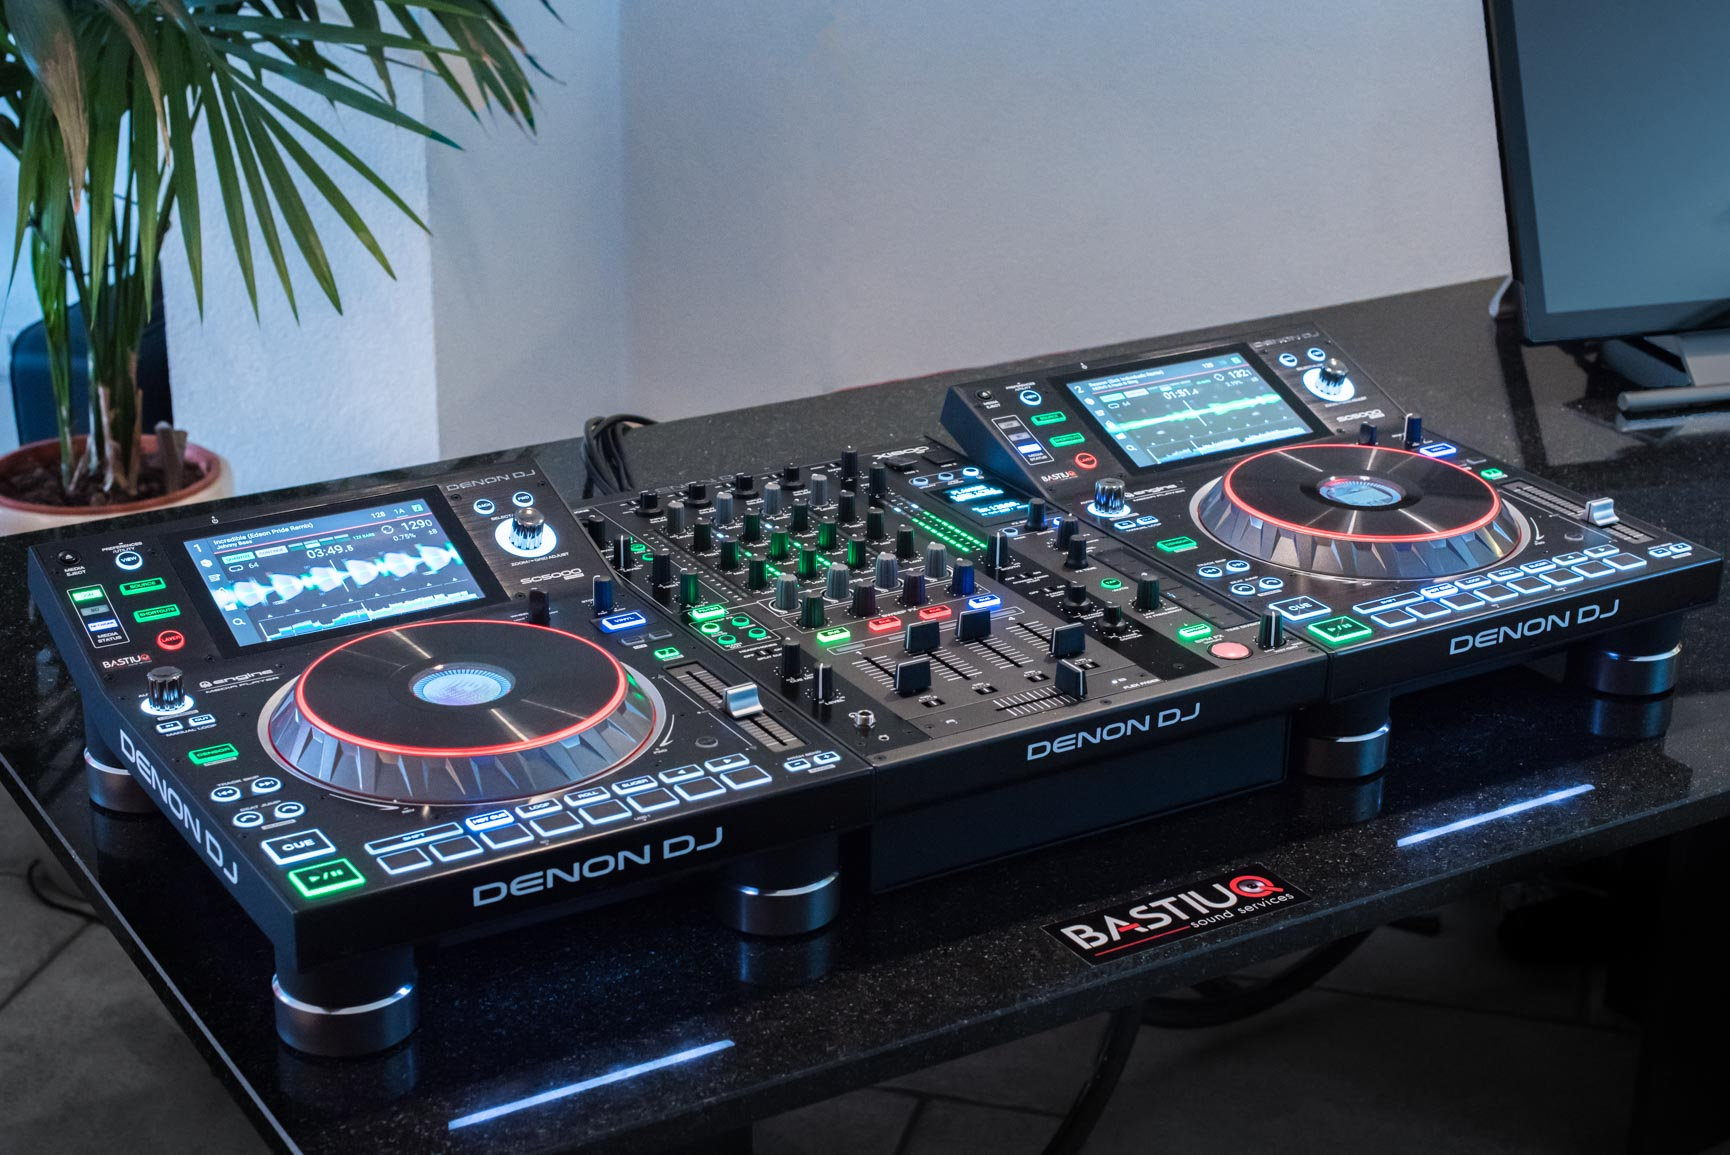 Denon DJ-set